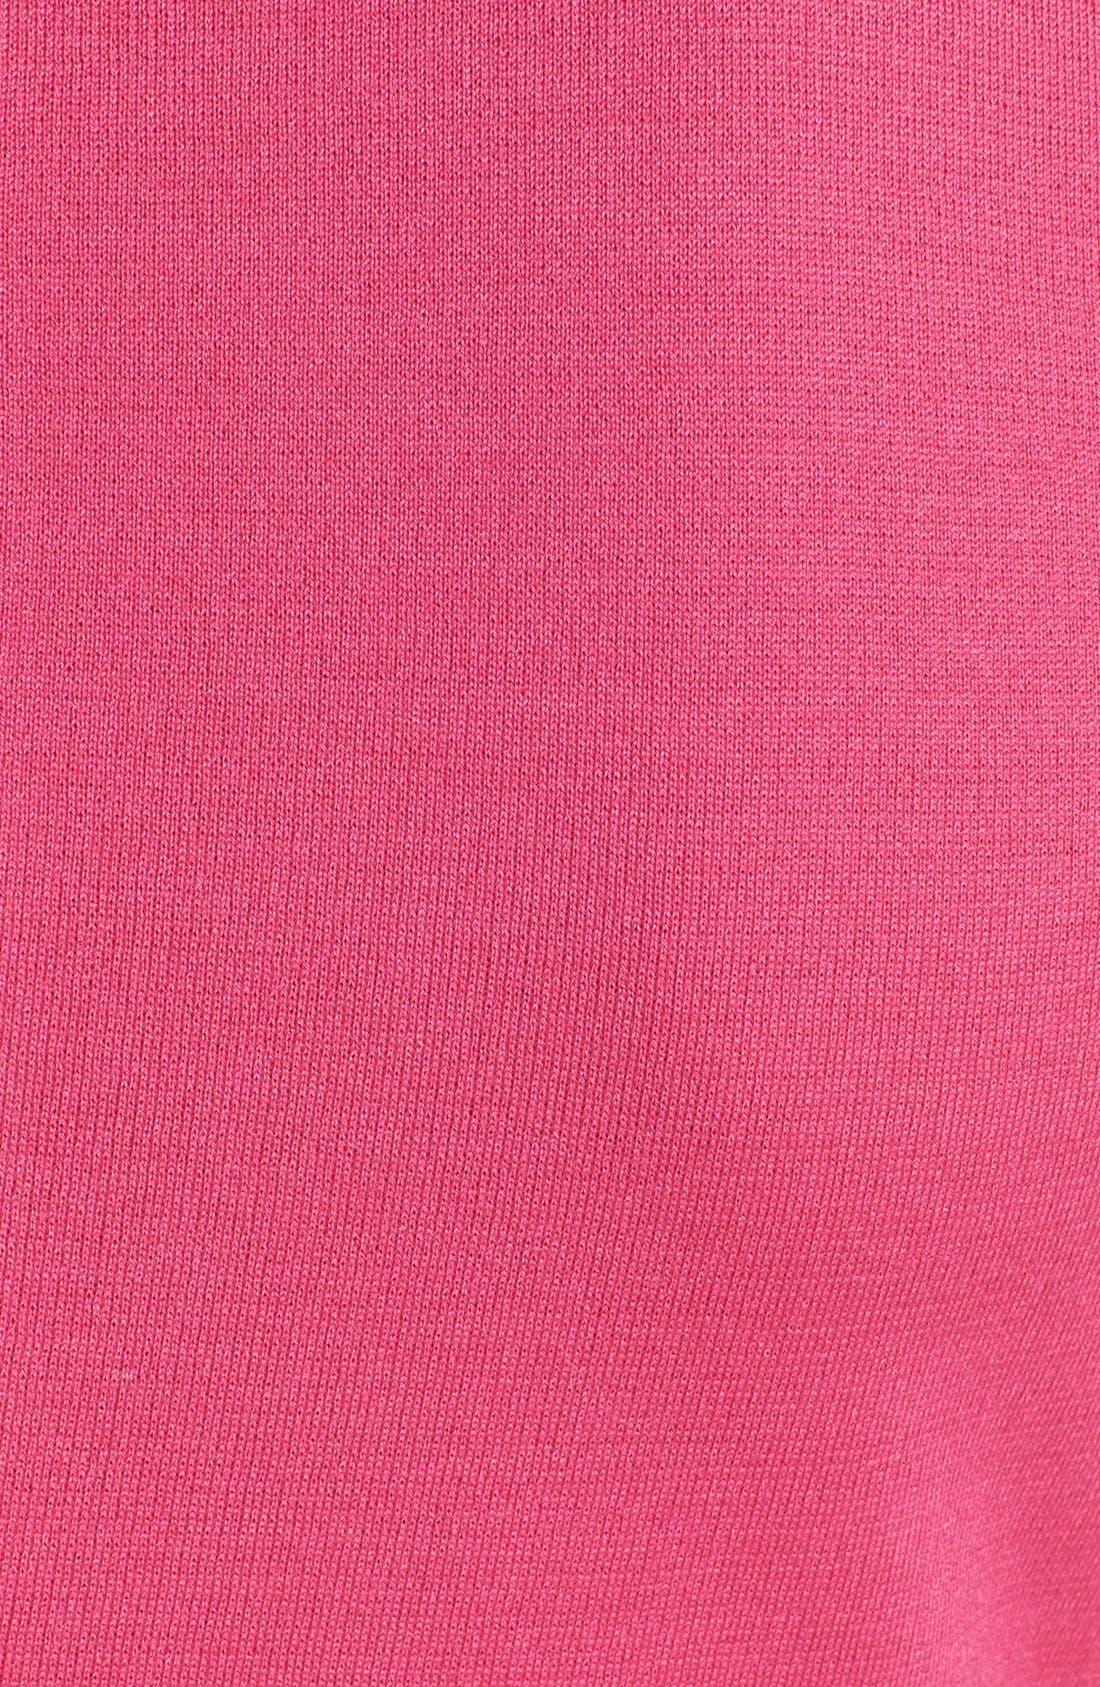 Alternate Image 3  - St. John Collection Scoop Neck Milano Knit Sheath Dress